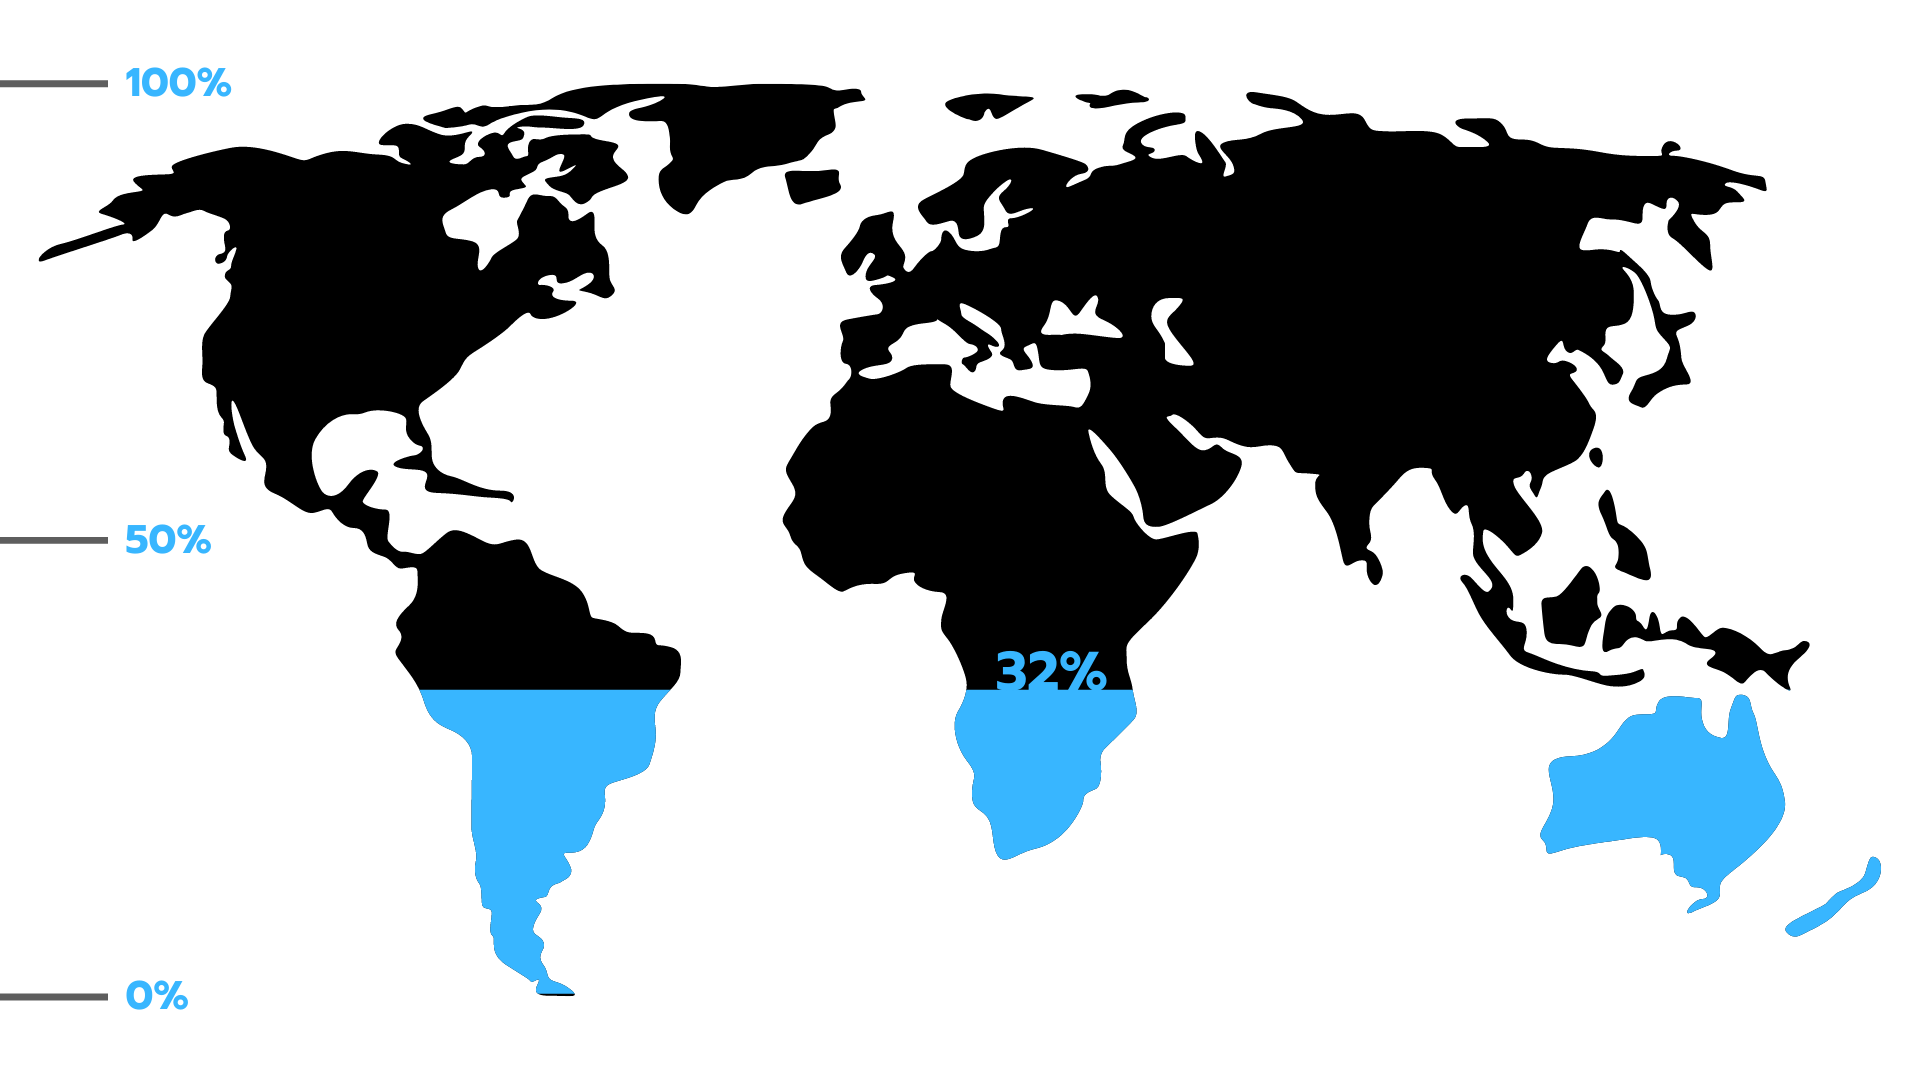 ONE JESSUP Map Progress Tracker